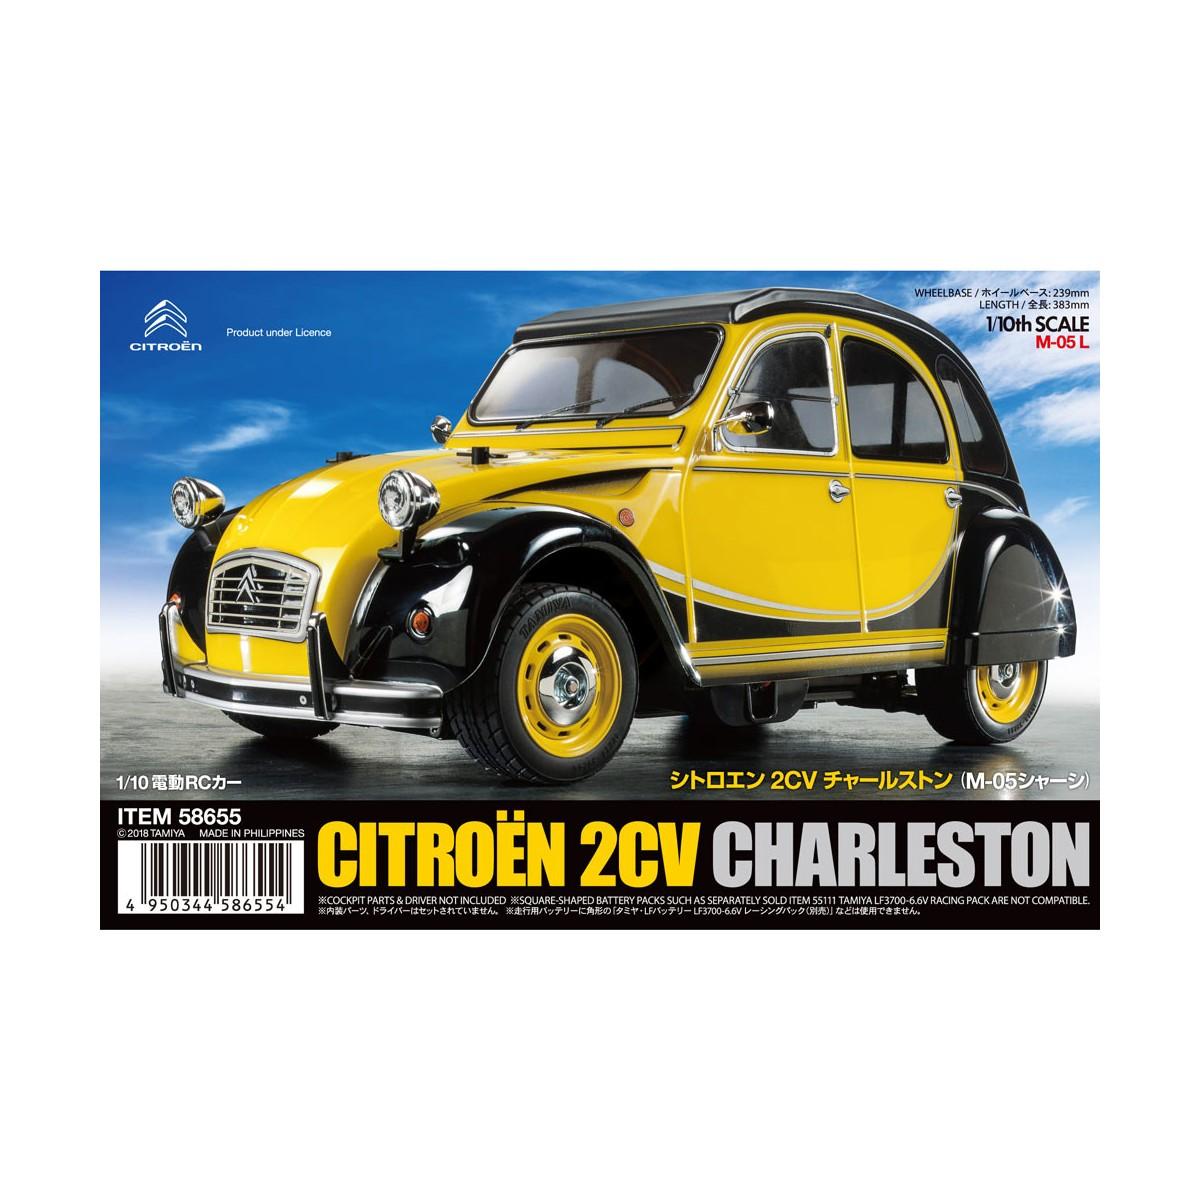 0f645849ff Tamiya 58655 Citroen 2CV (Ente) Charleston M-05 Bausatz